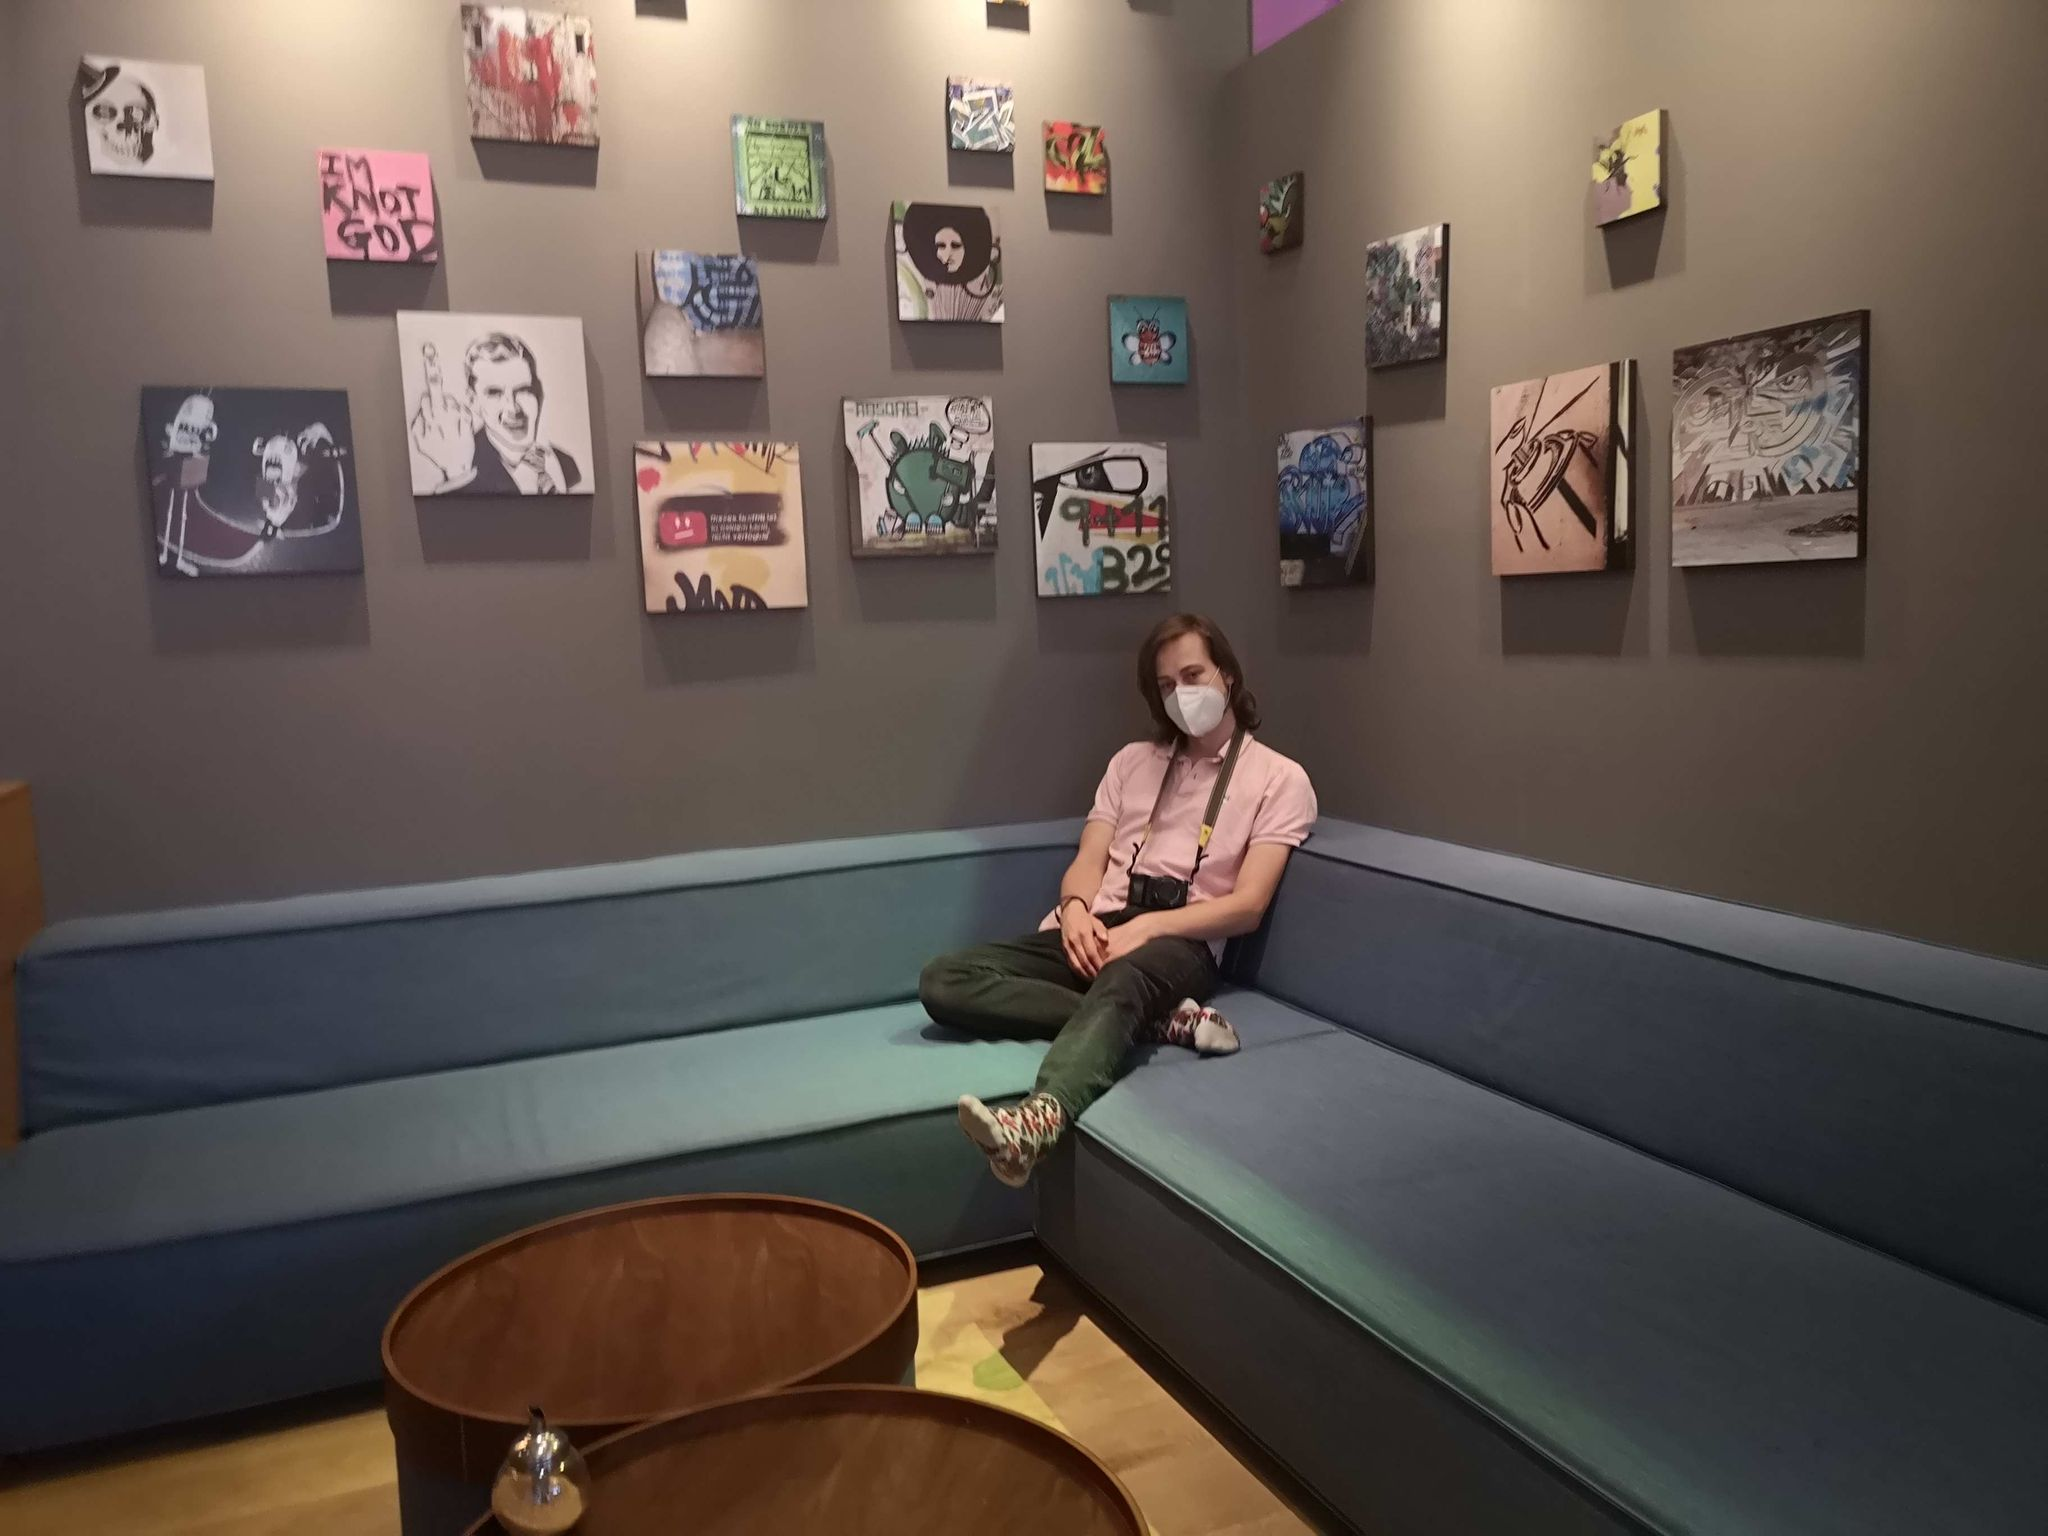 Sitzecke in der Lobby/Bar